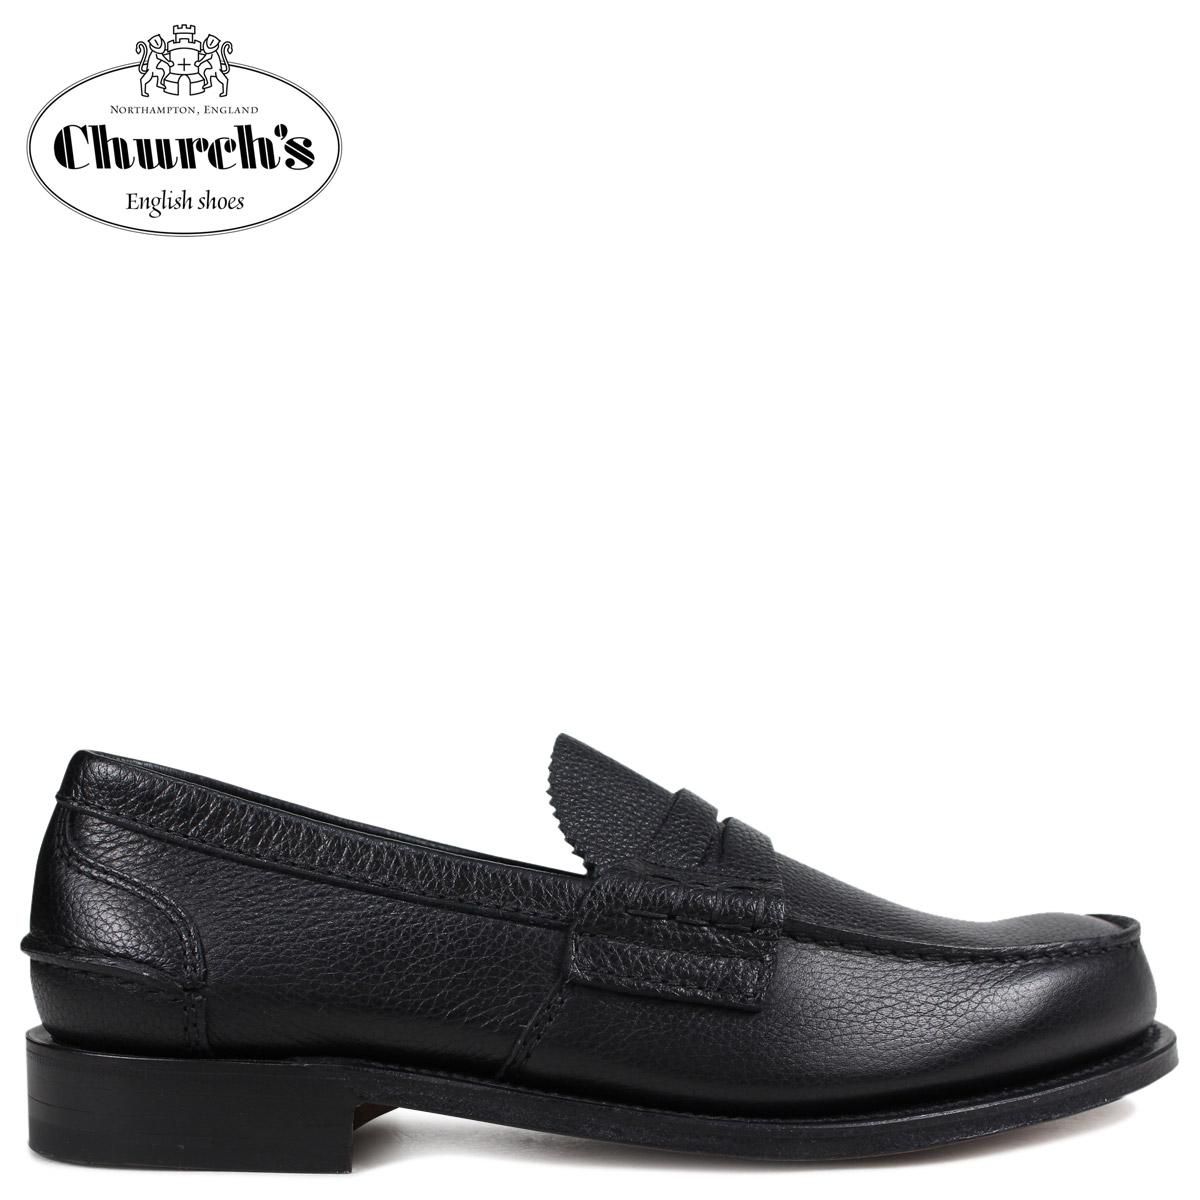 Church's 靴 チャーチ ローファー メンズ PEMBREY LOAFERS ブラック EDB003